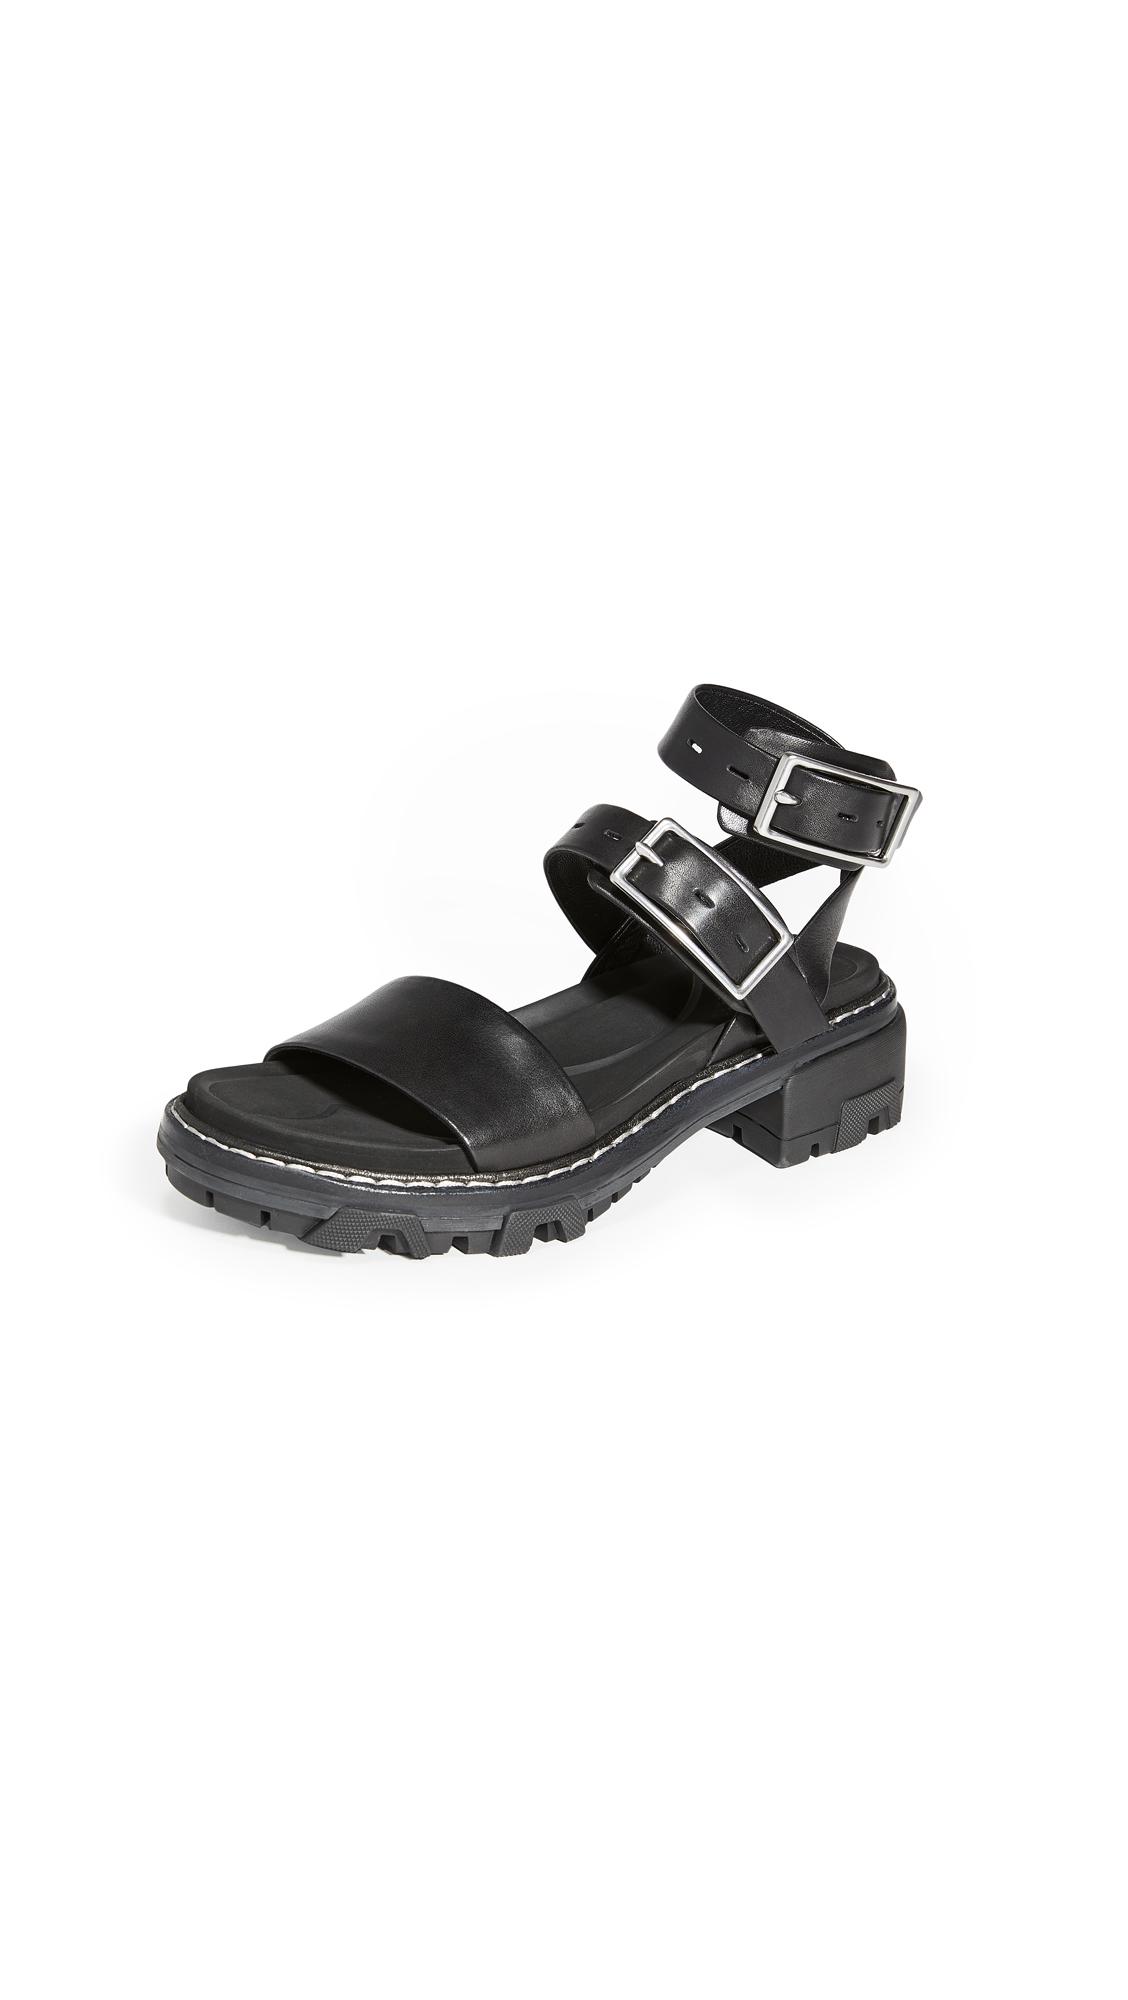 Rag & Bone Shiloh Sandals - 30% Off Sale